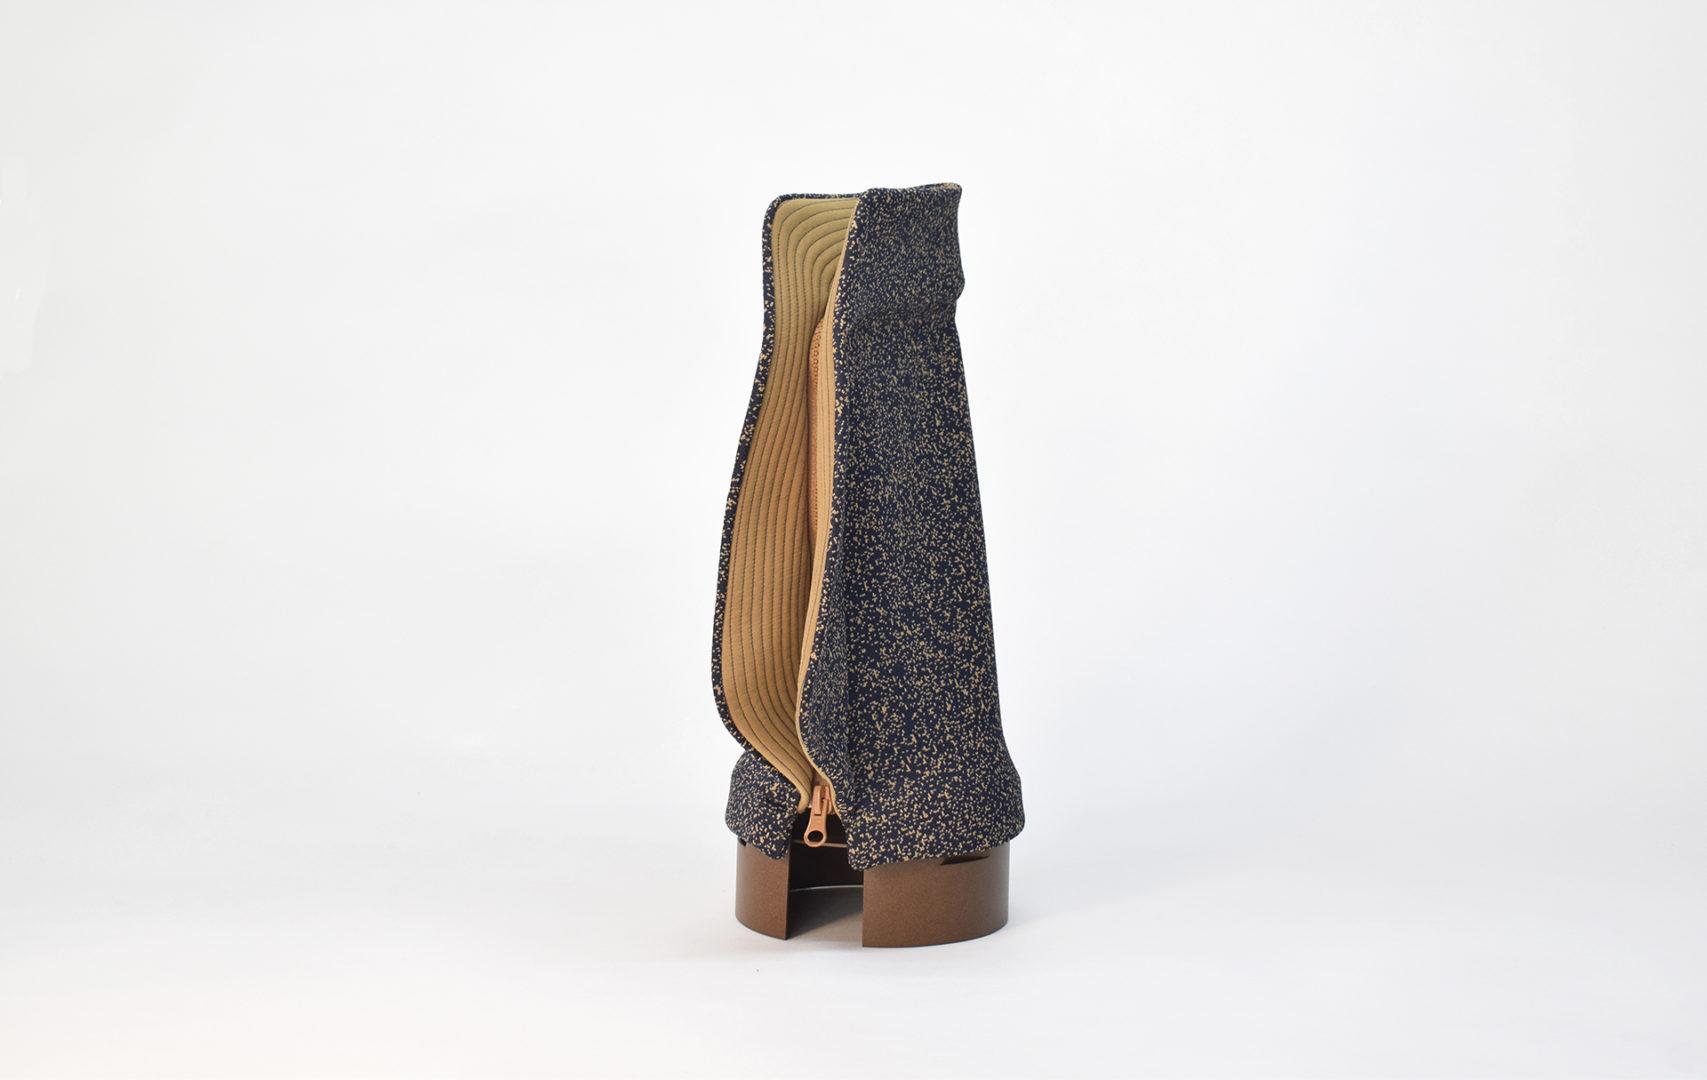 Muette-lamp-brown-Yvan-Caillaud-6